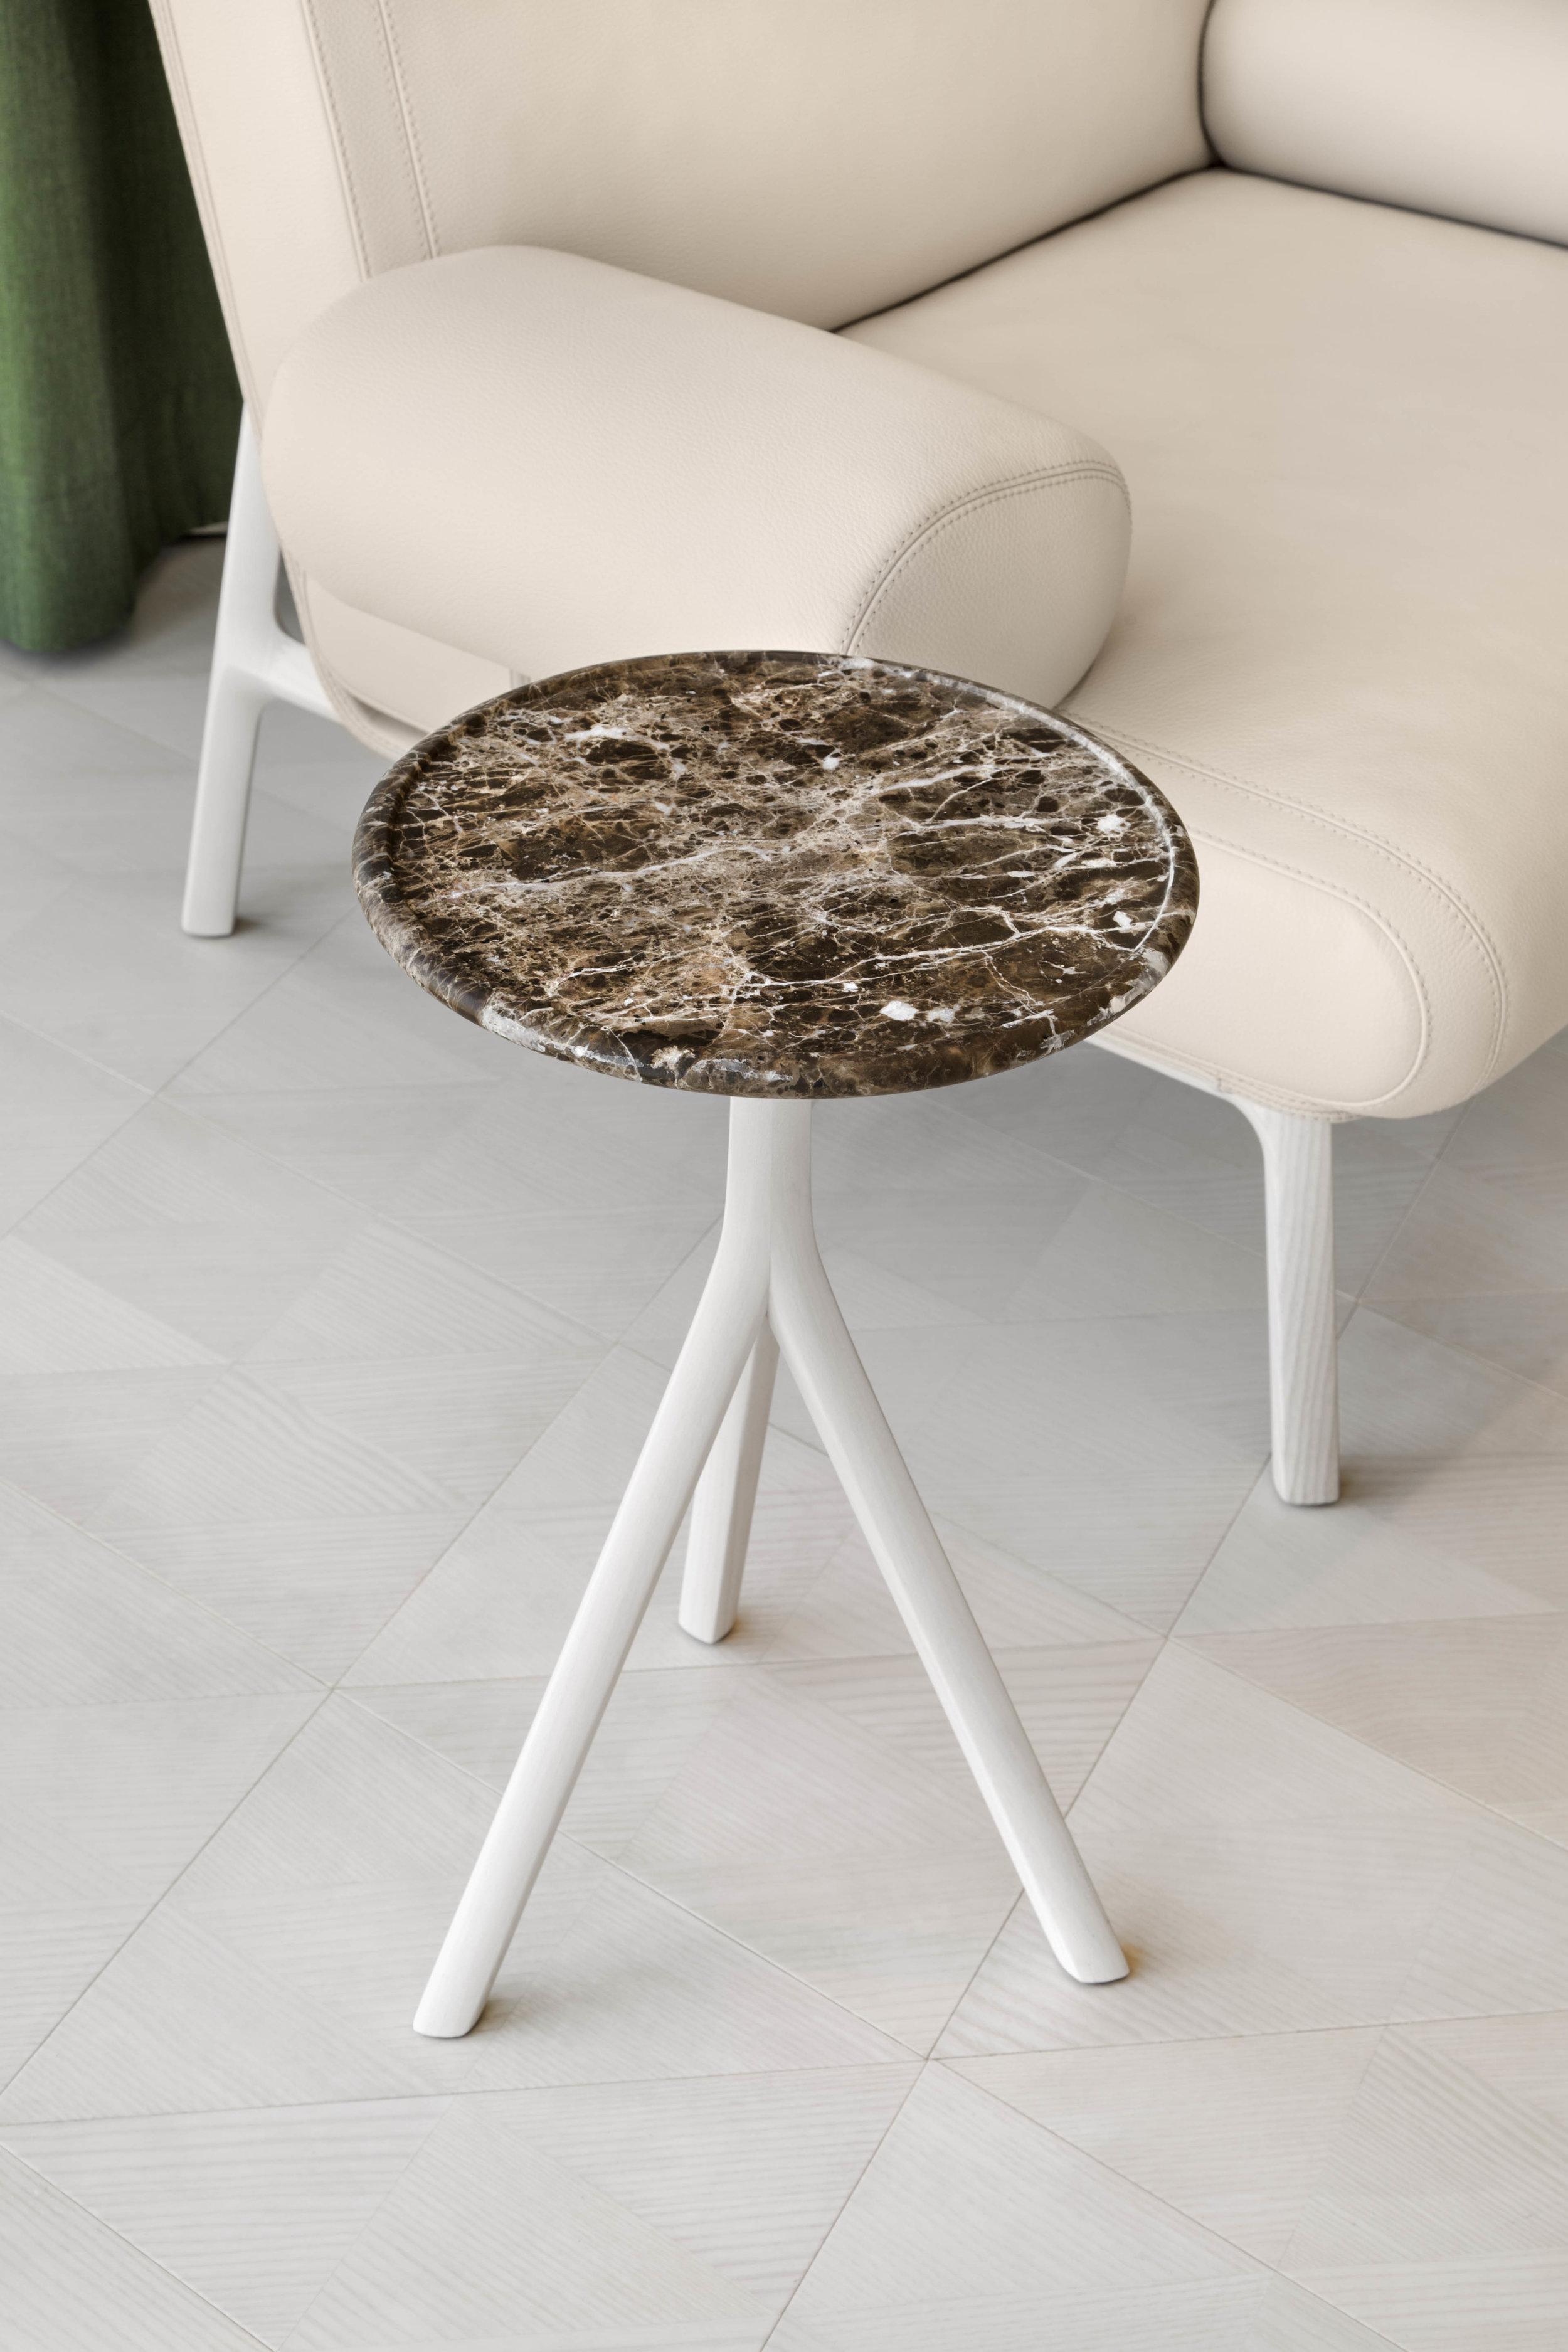 medeo-armchair_furniture-design_coordination-berlin_02.jpg